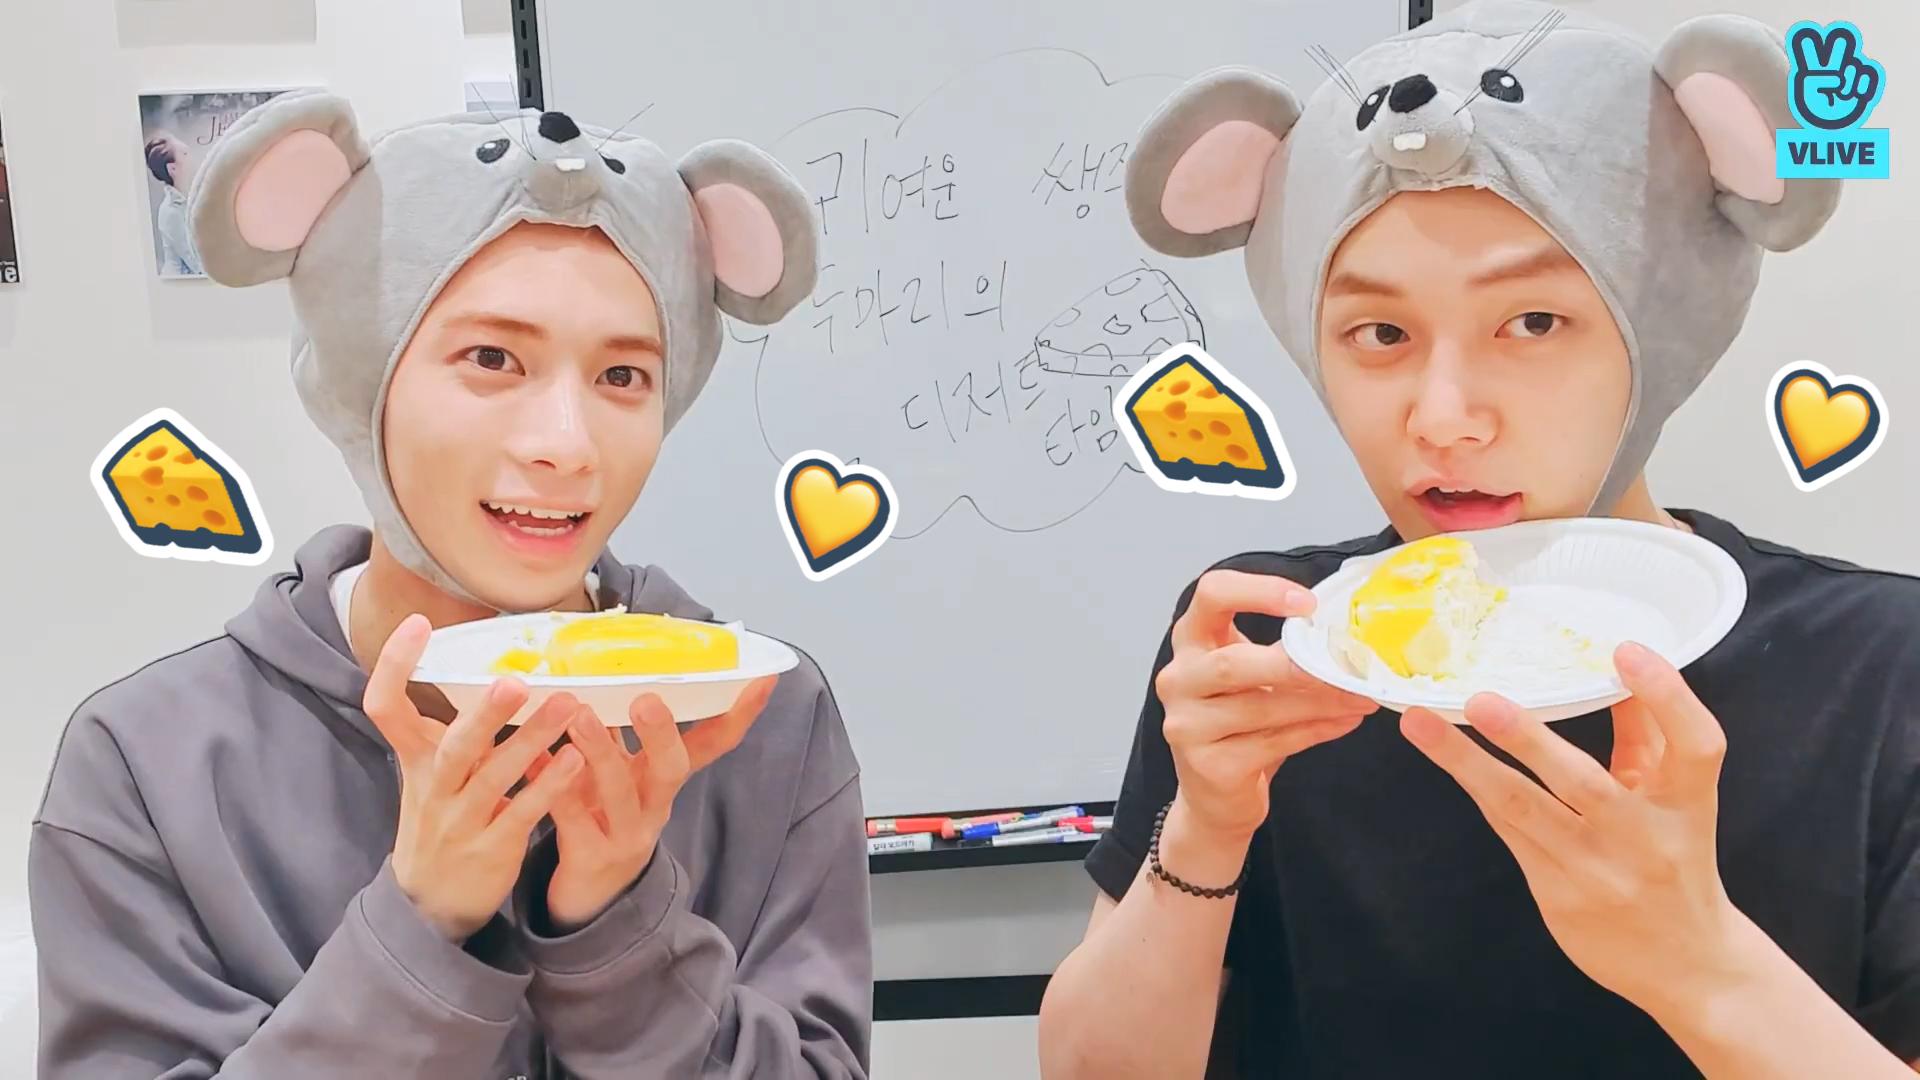 [TXT] 투바투의 행복으로 세계 평화 이뤄낸다🧀💛 (TAEHYUN&YEONJUN talking about when they are happy)